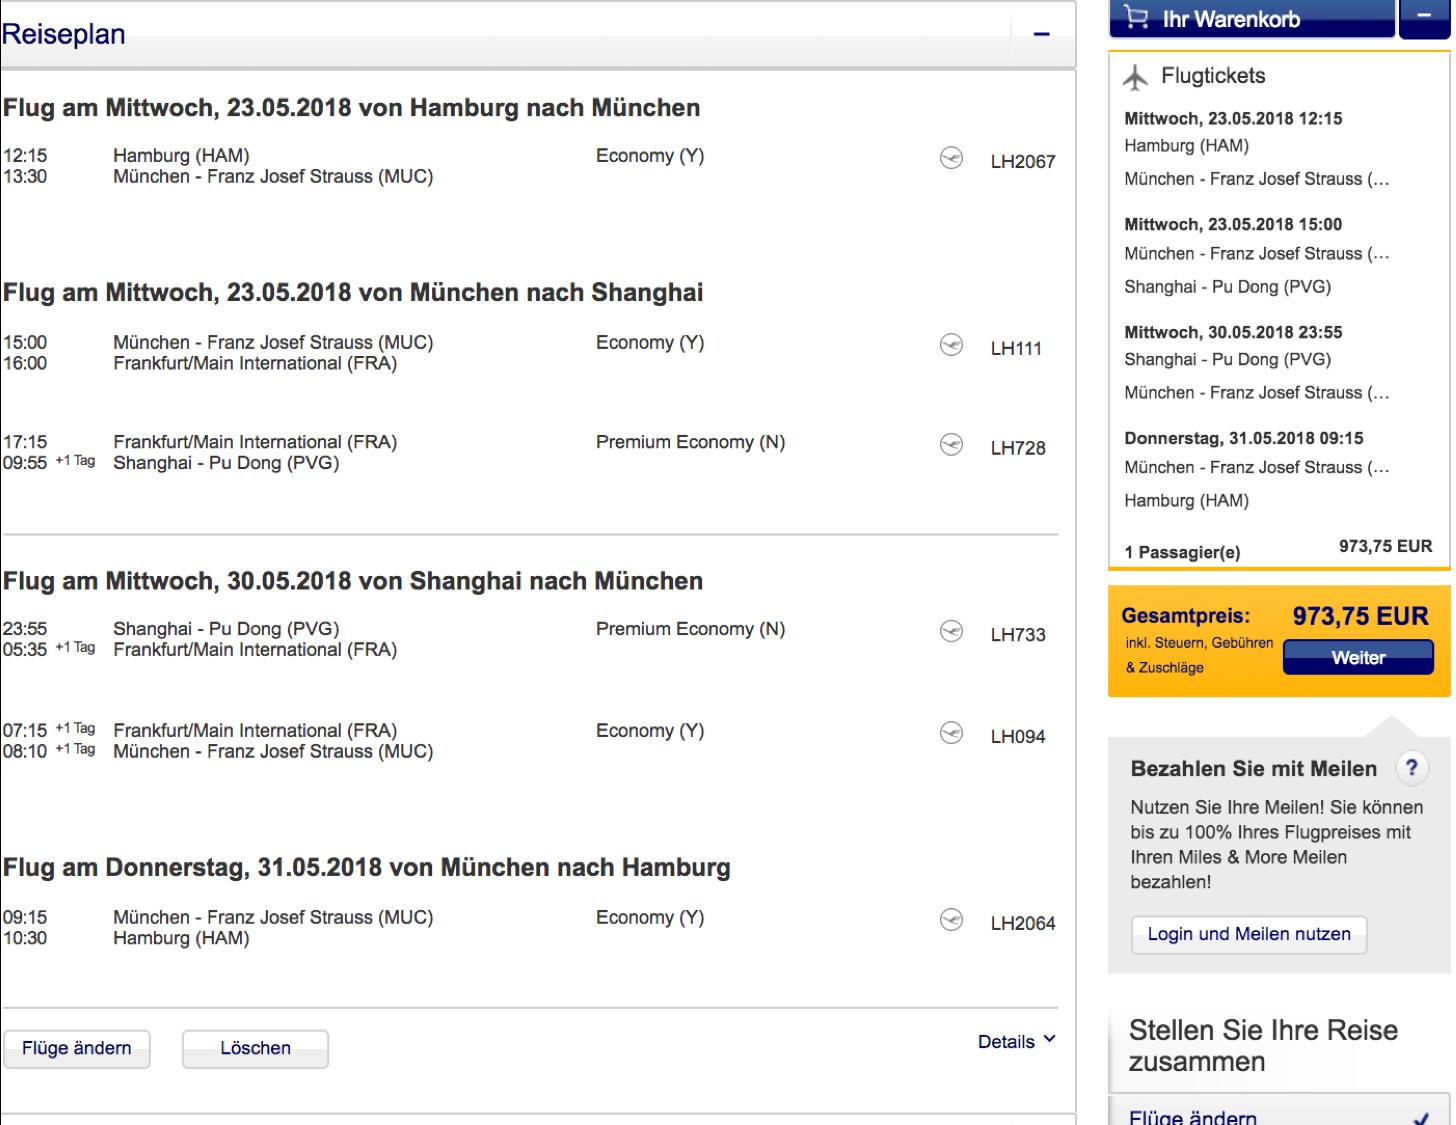 Lufthansa Premium Economy Class Sale